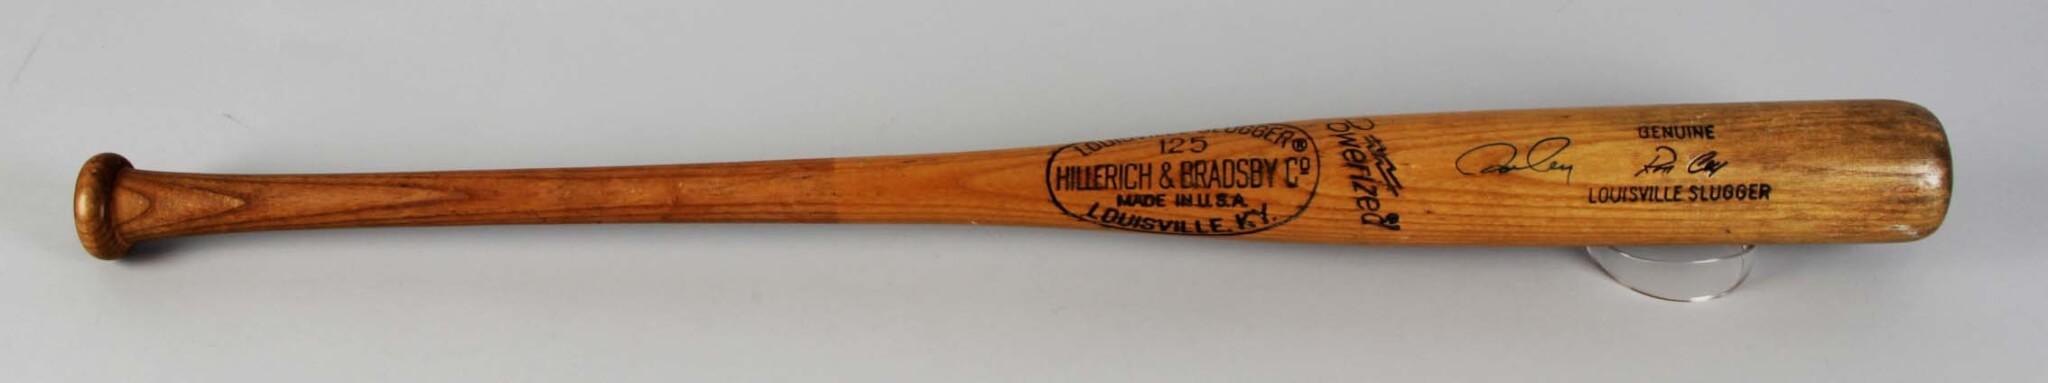 1974 Ron Cey Game-Used, Signed Baseball Bat LA Dodgers - COA PSA/DNA